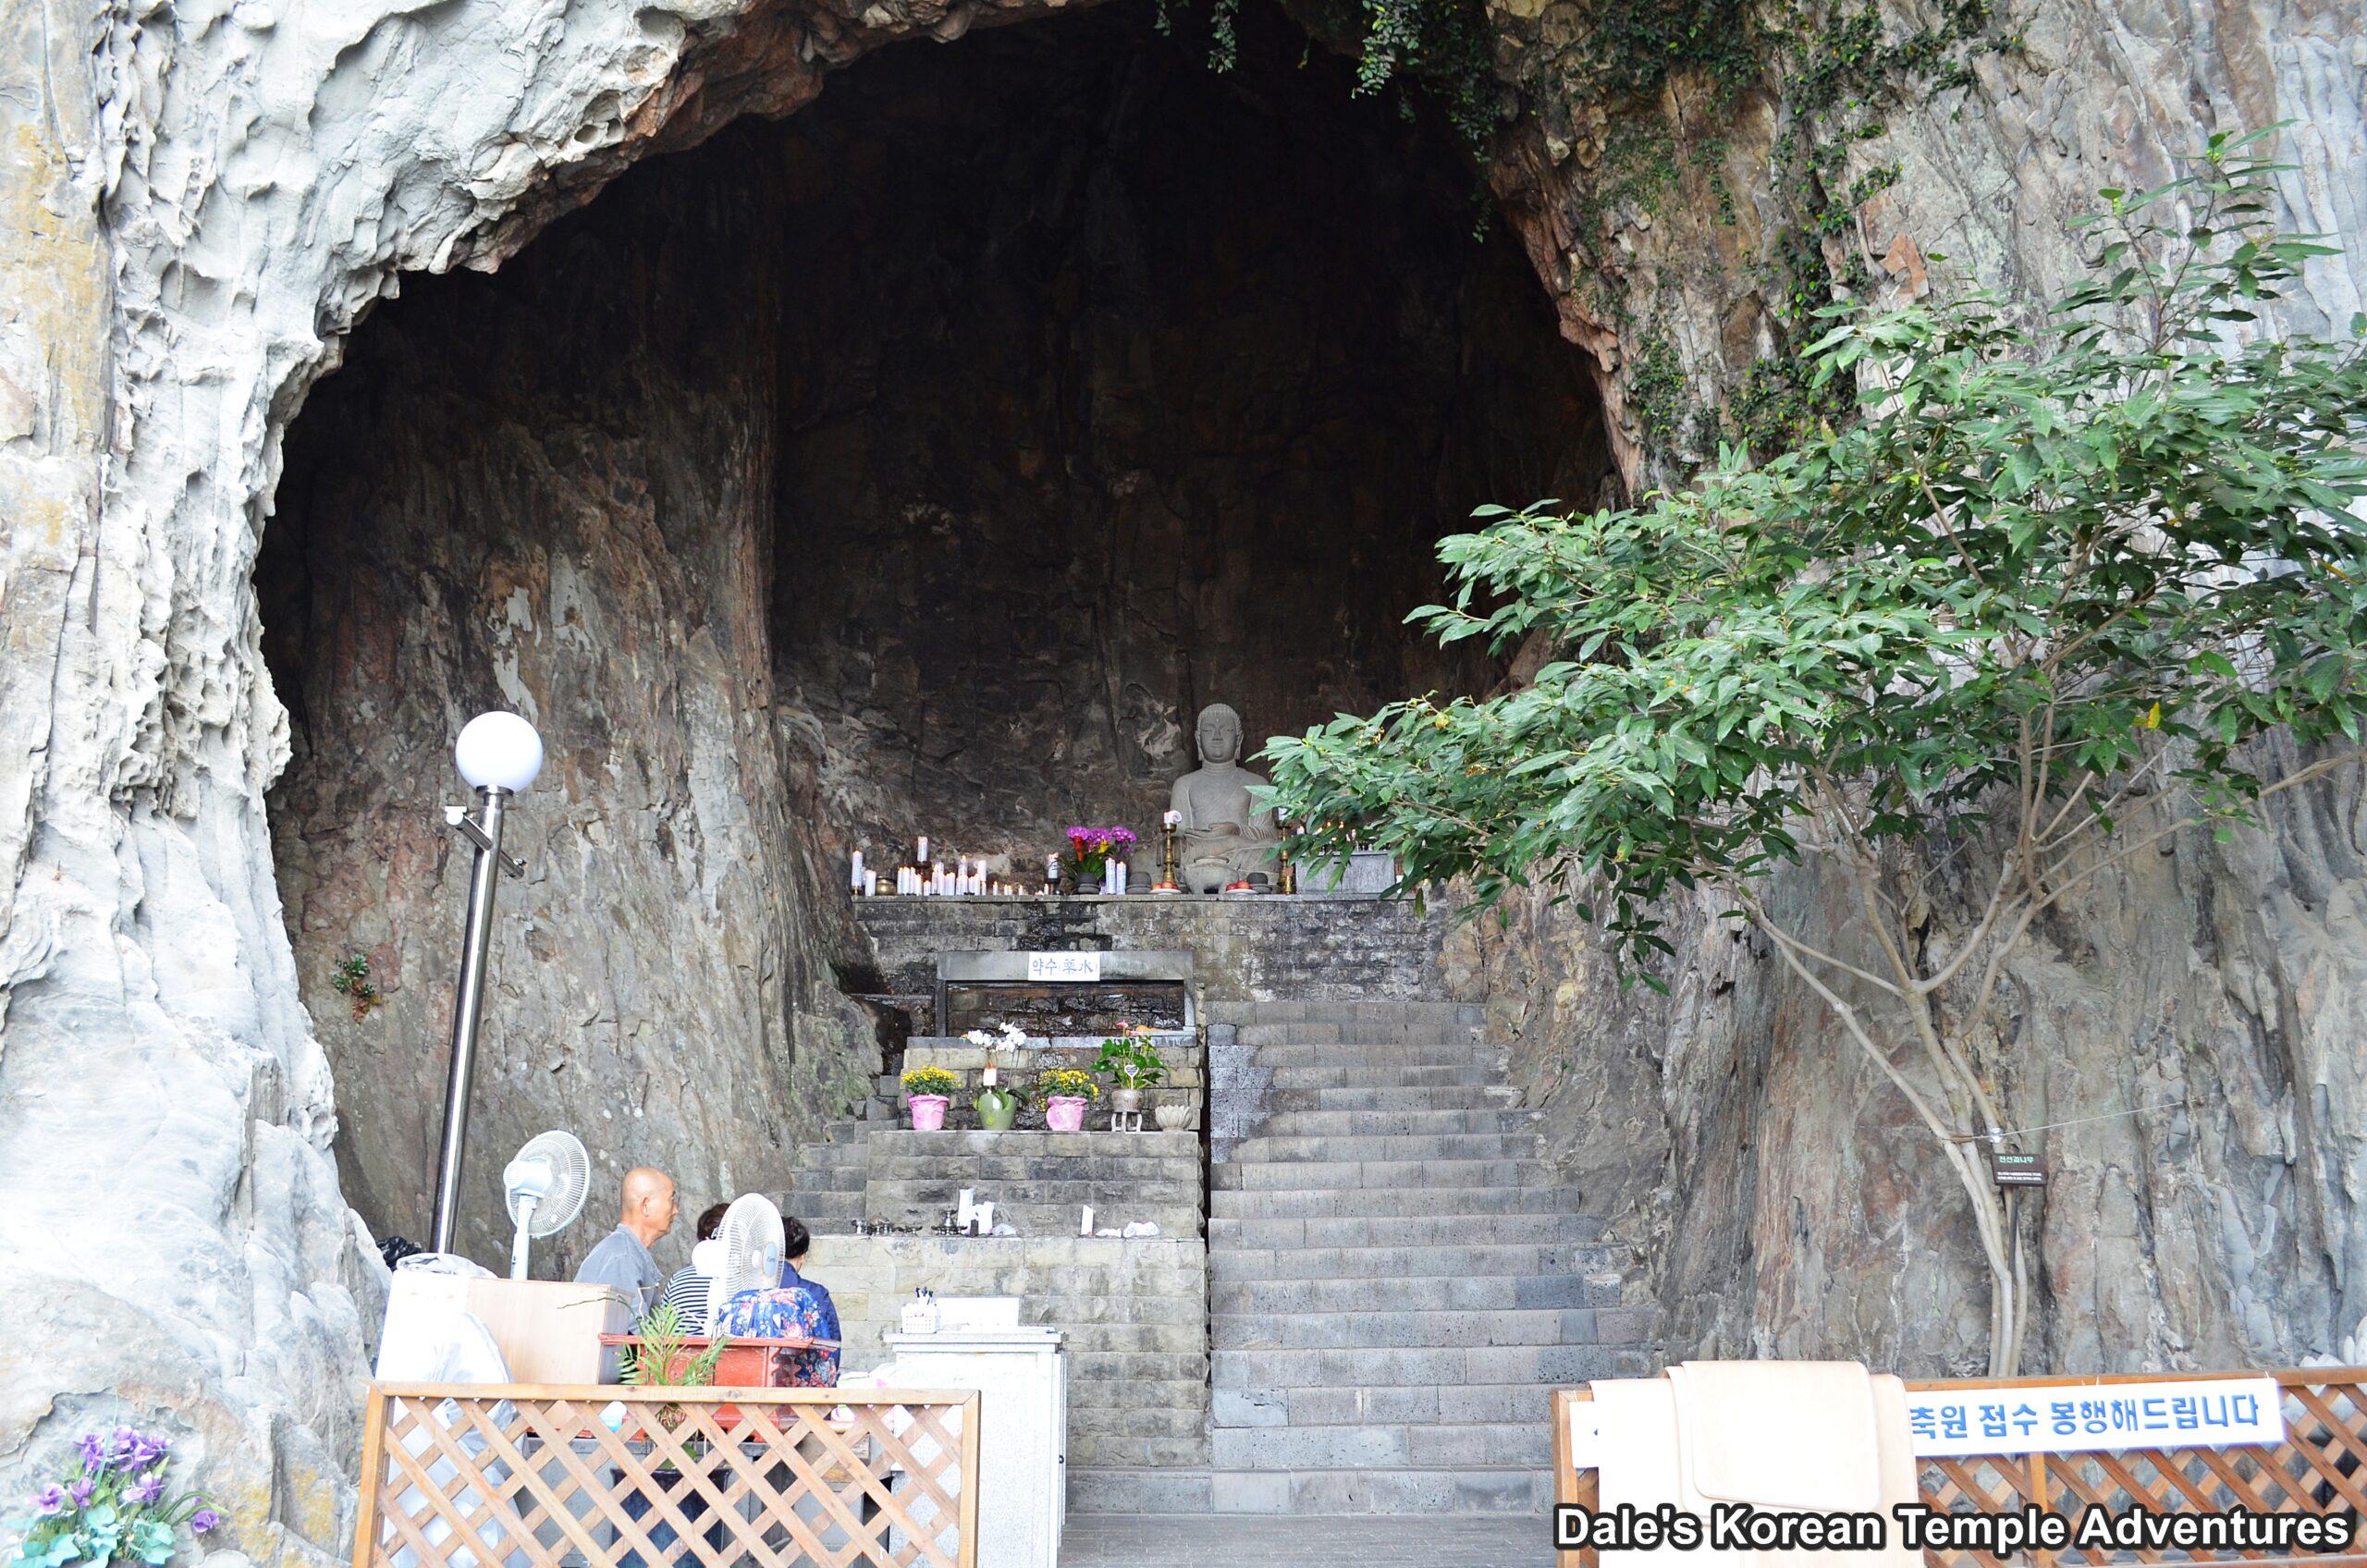 sanbangsan-cave-temple